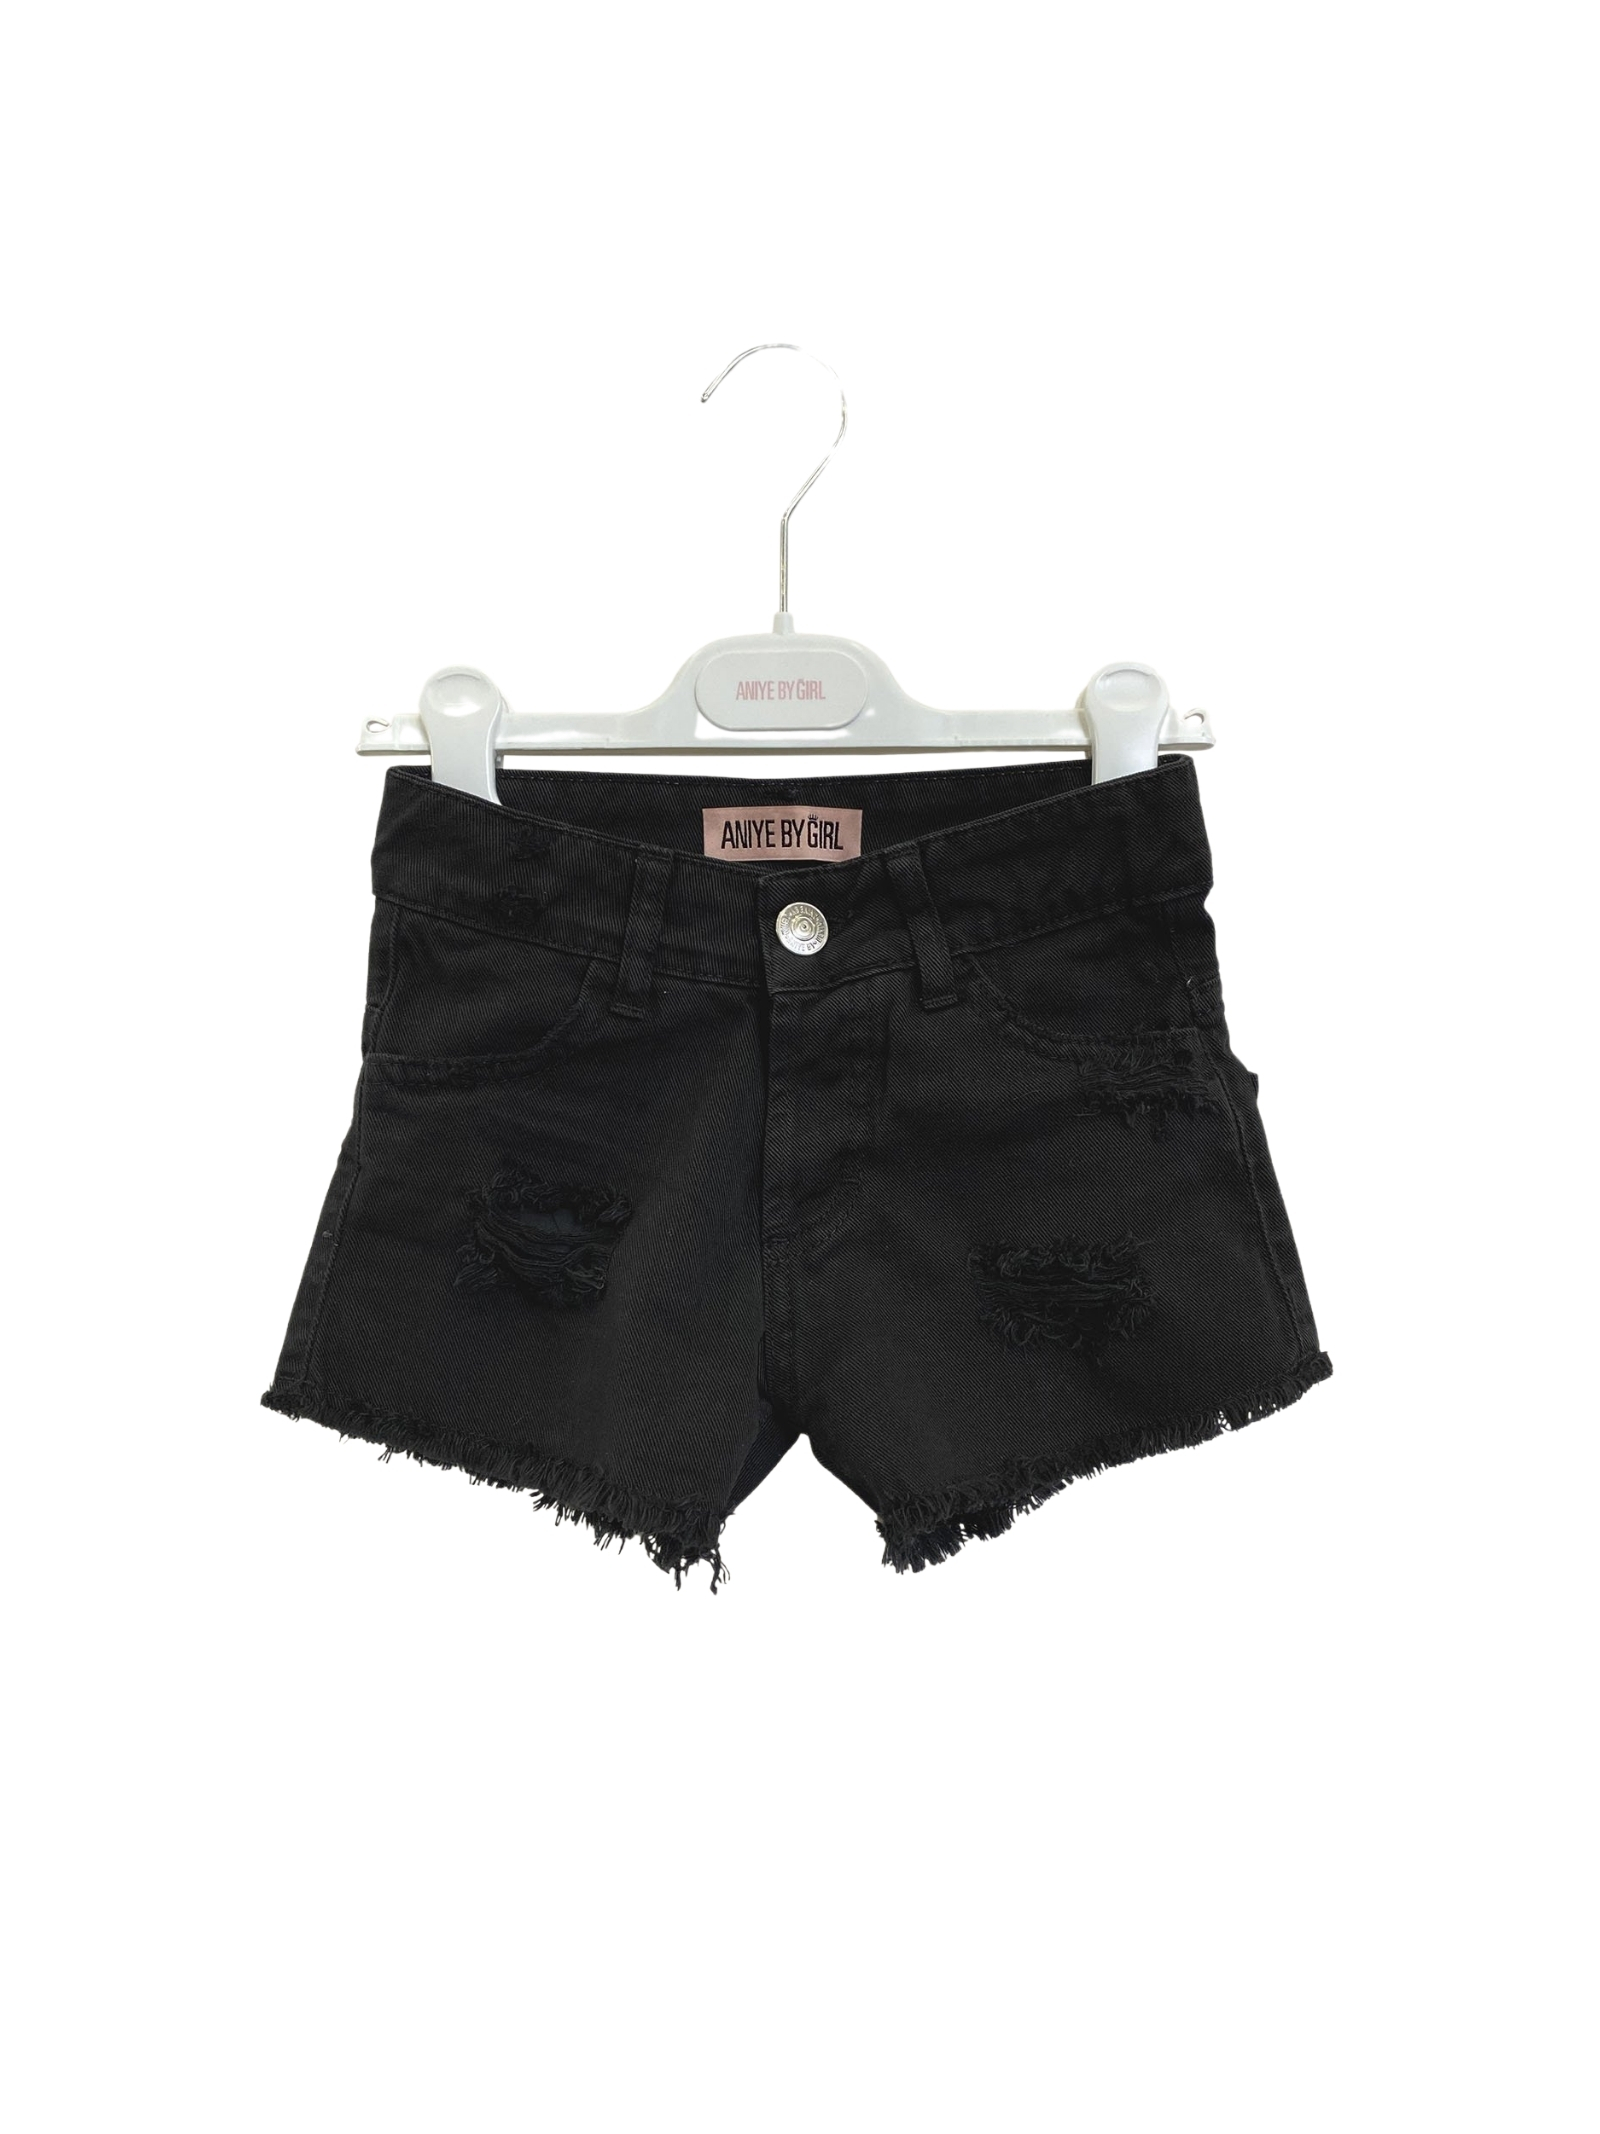 Shorts Aniye Bambina ANIYE BY GIRL | Shorts | 11503900002